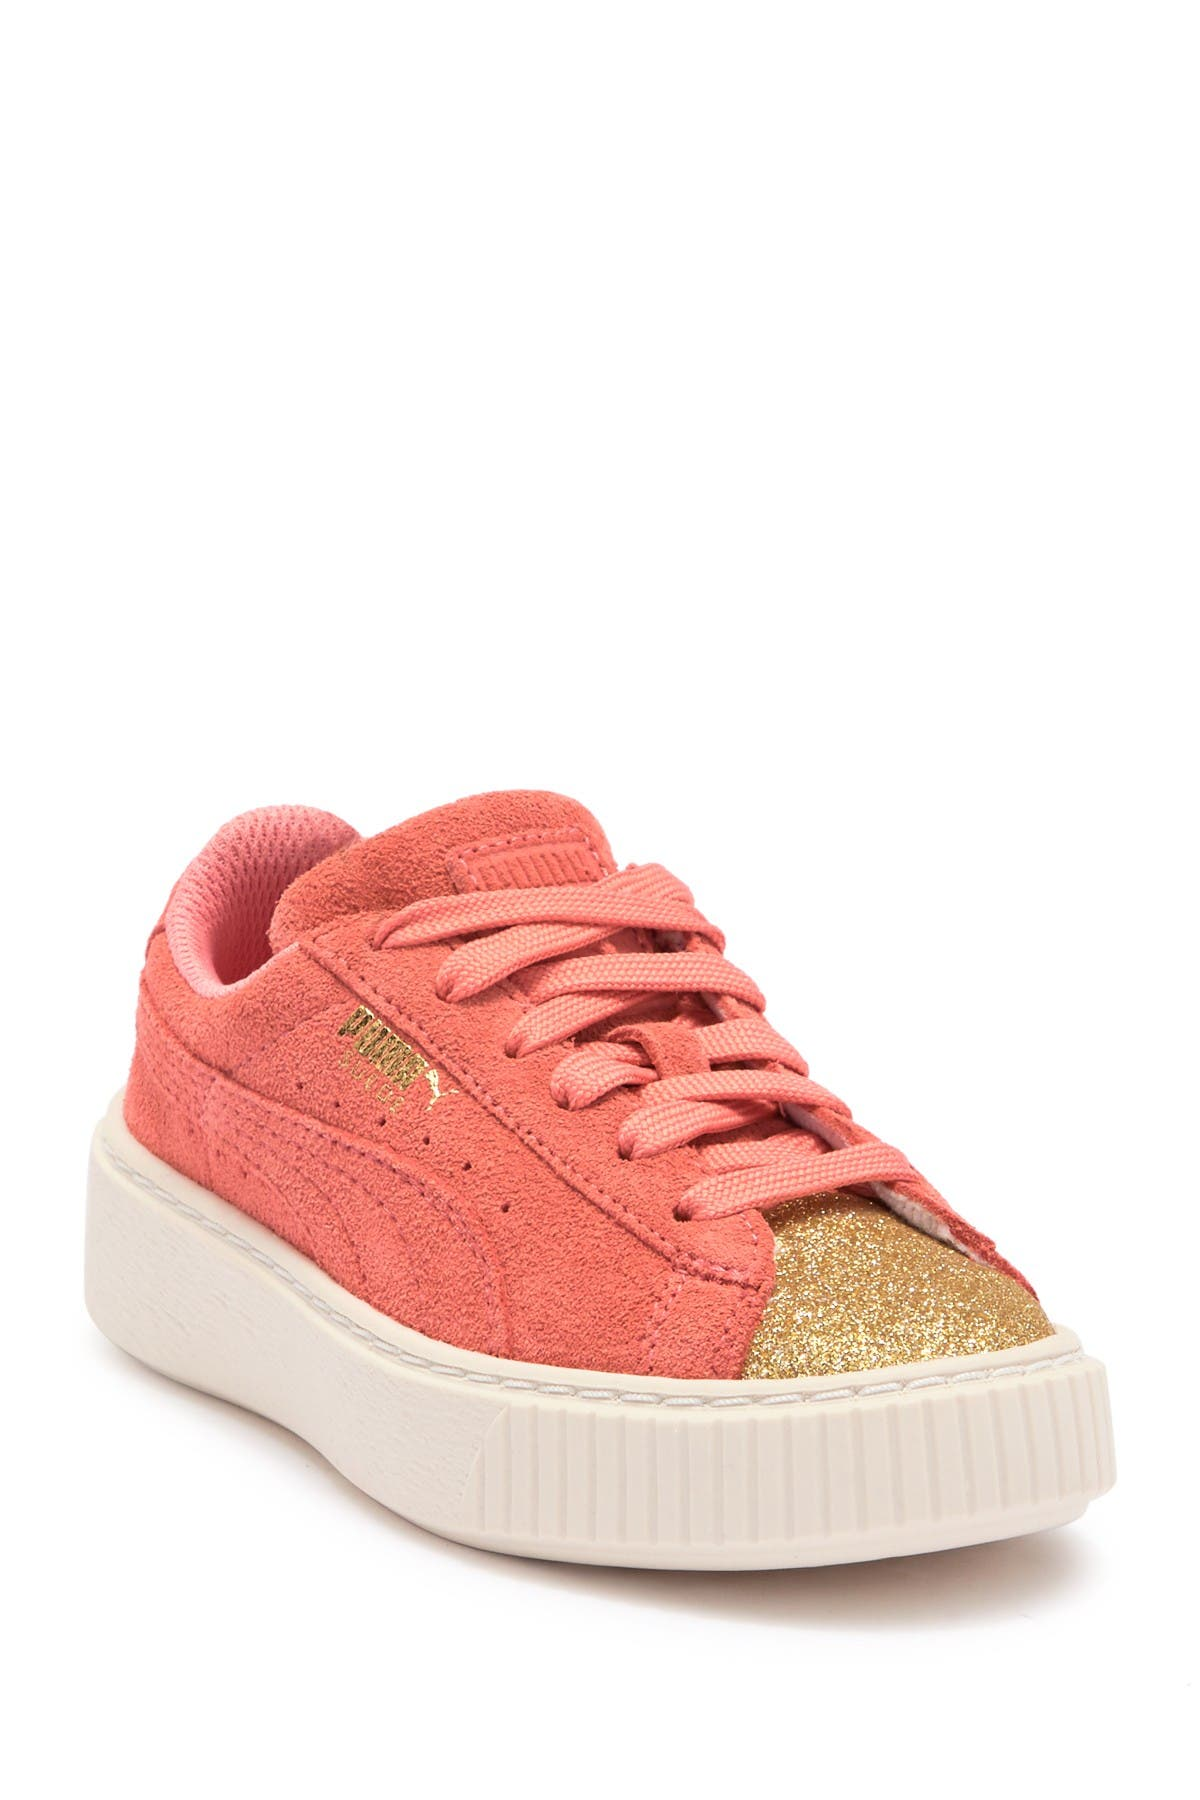 Image of PUMA Suede Platform Glam PS Sneaker